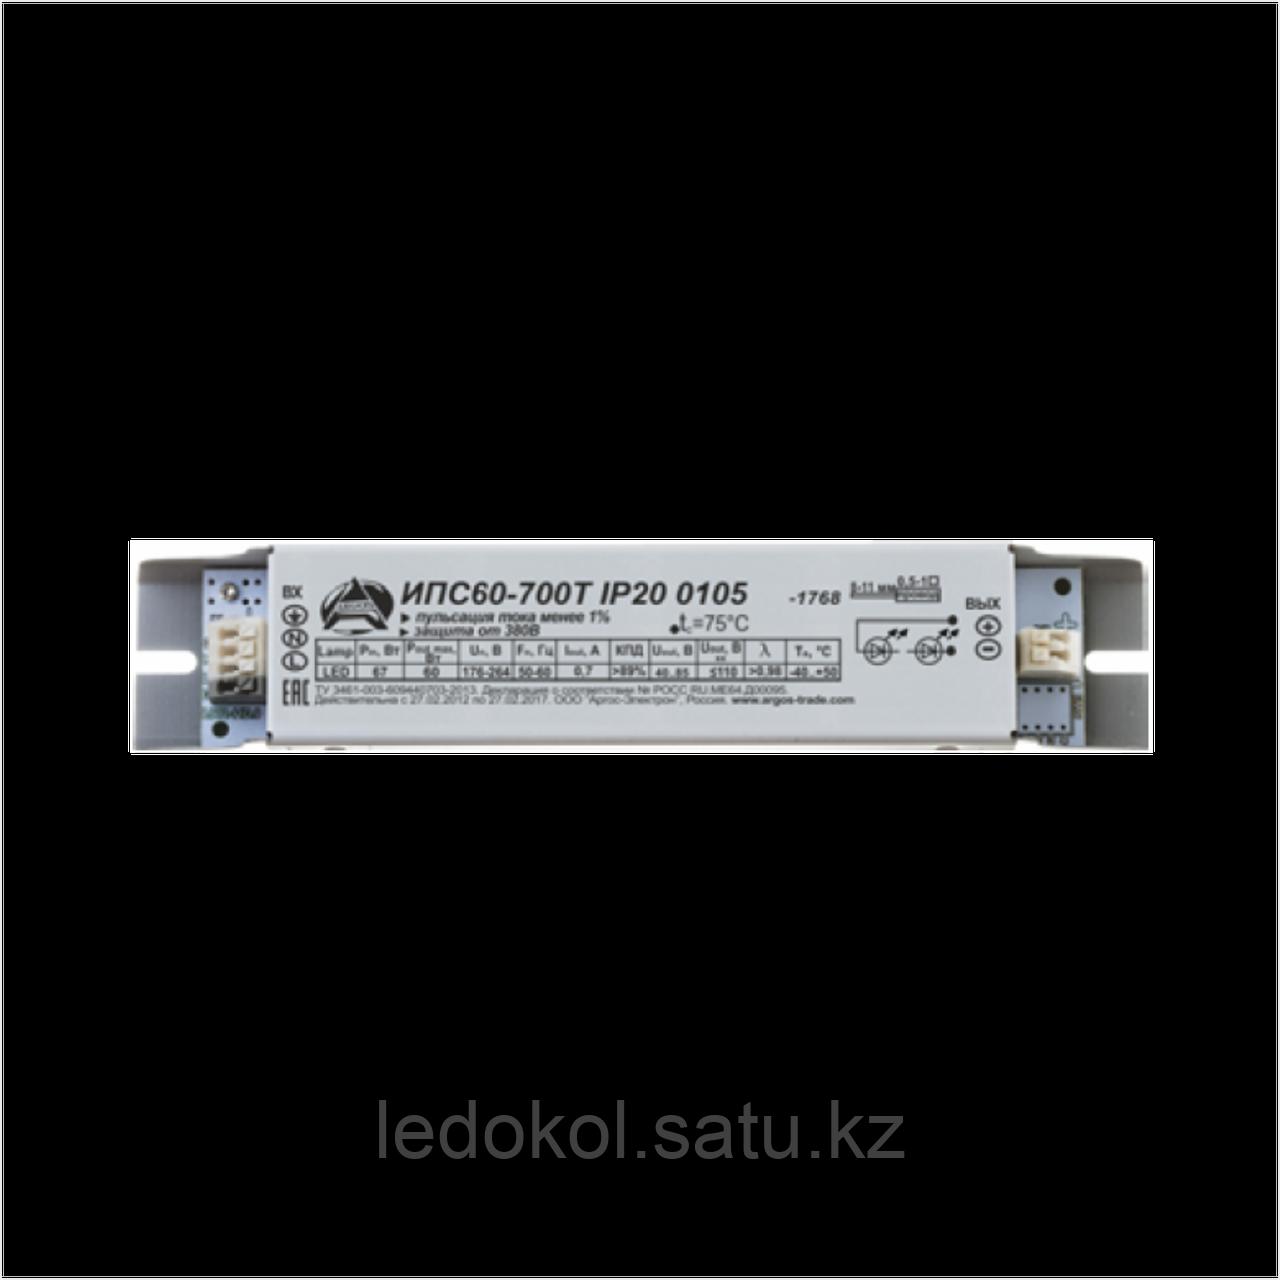 Источник питания Аргос ИПС60-700ТД(400-700) IP20 0105